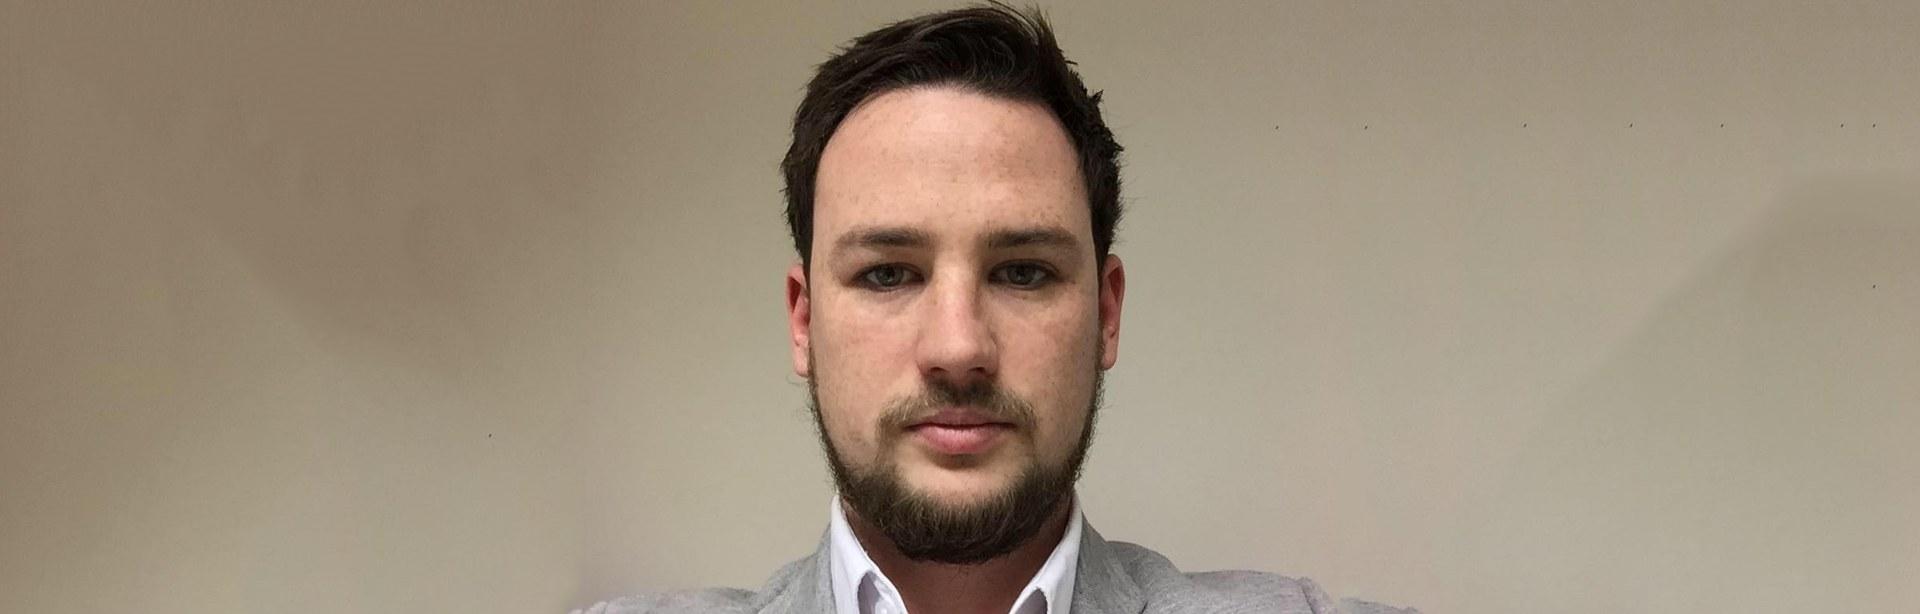 Nicholas Llewelyn-Jones, PolyBionics